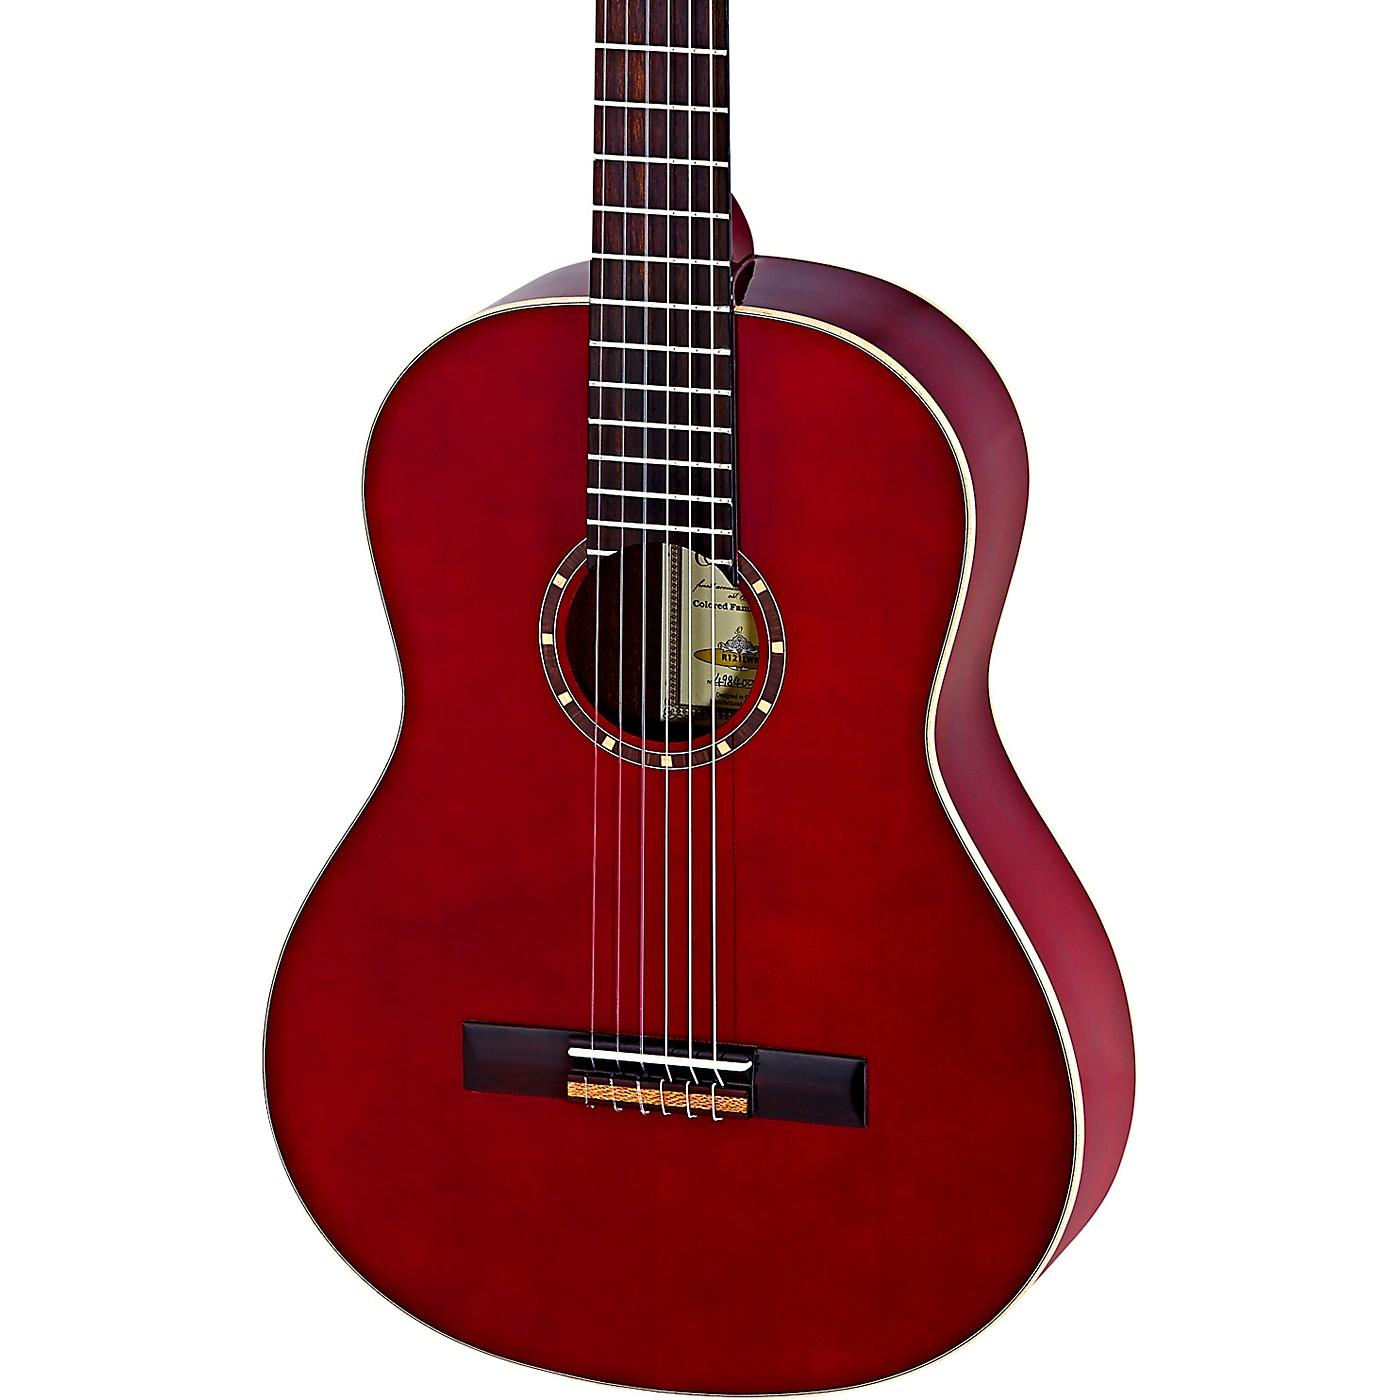 Ortega Family Series R121LWR Left-Handed Classical Guitar thumbnail